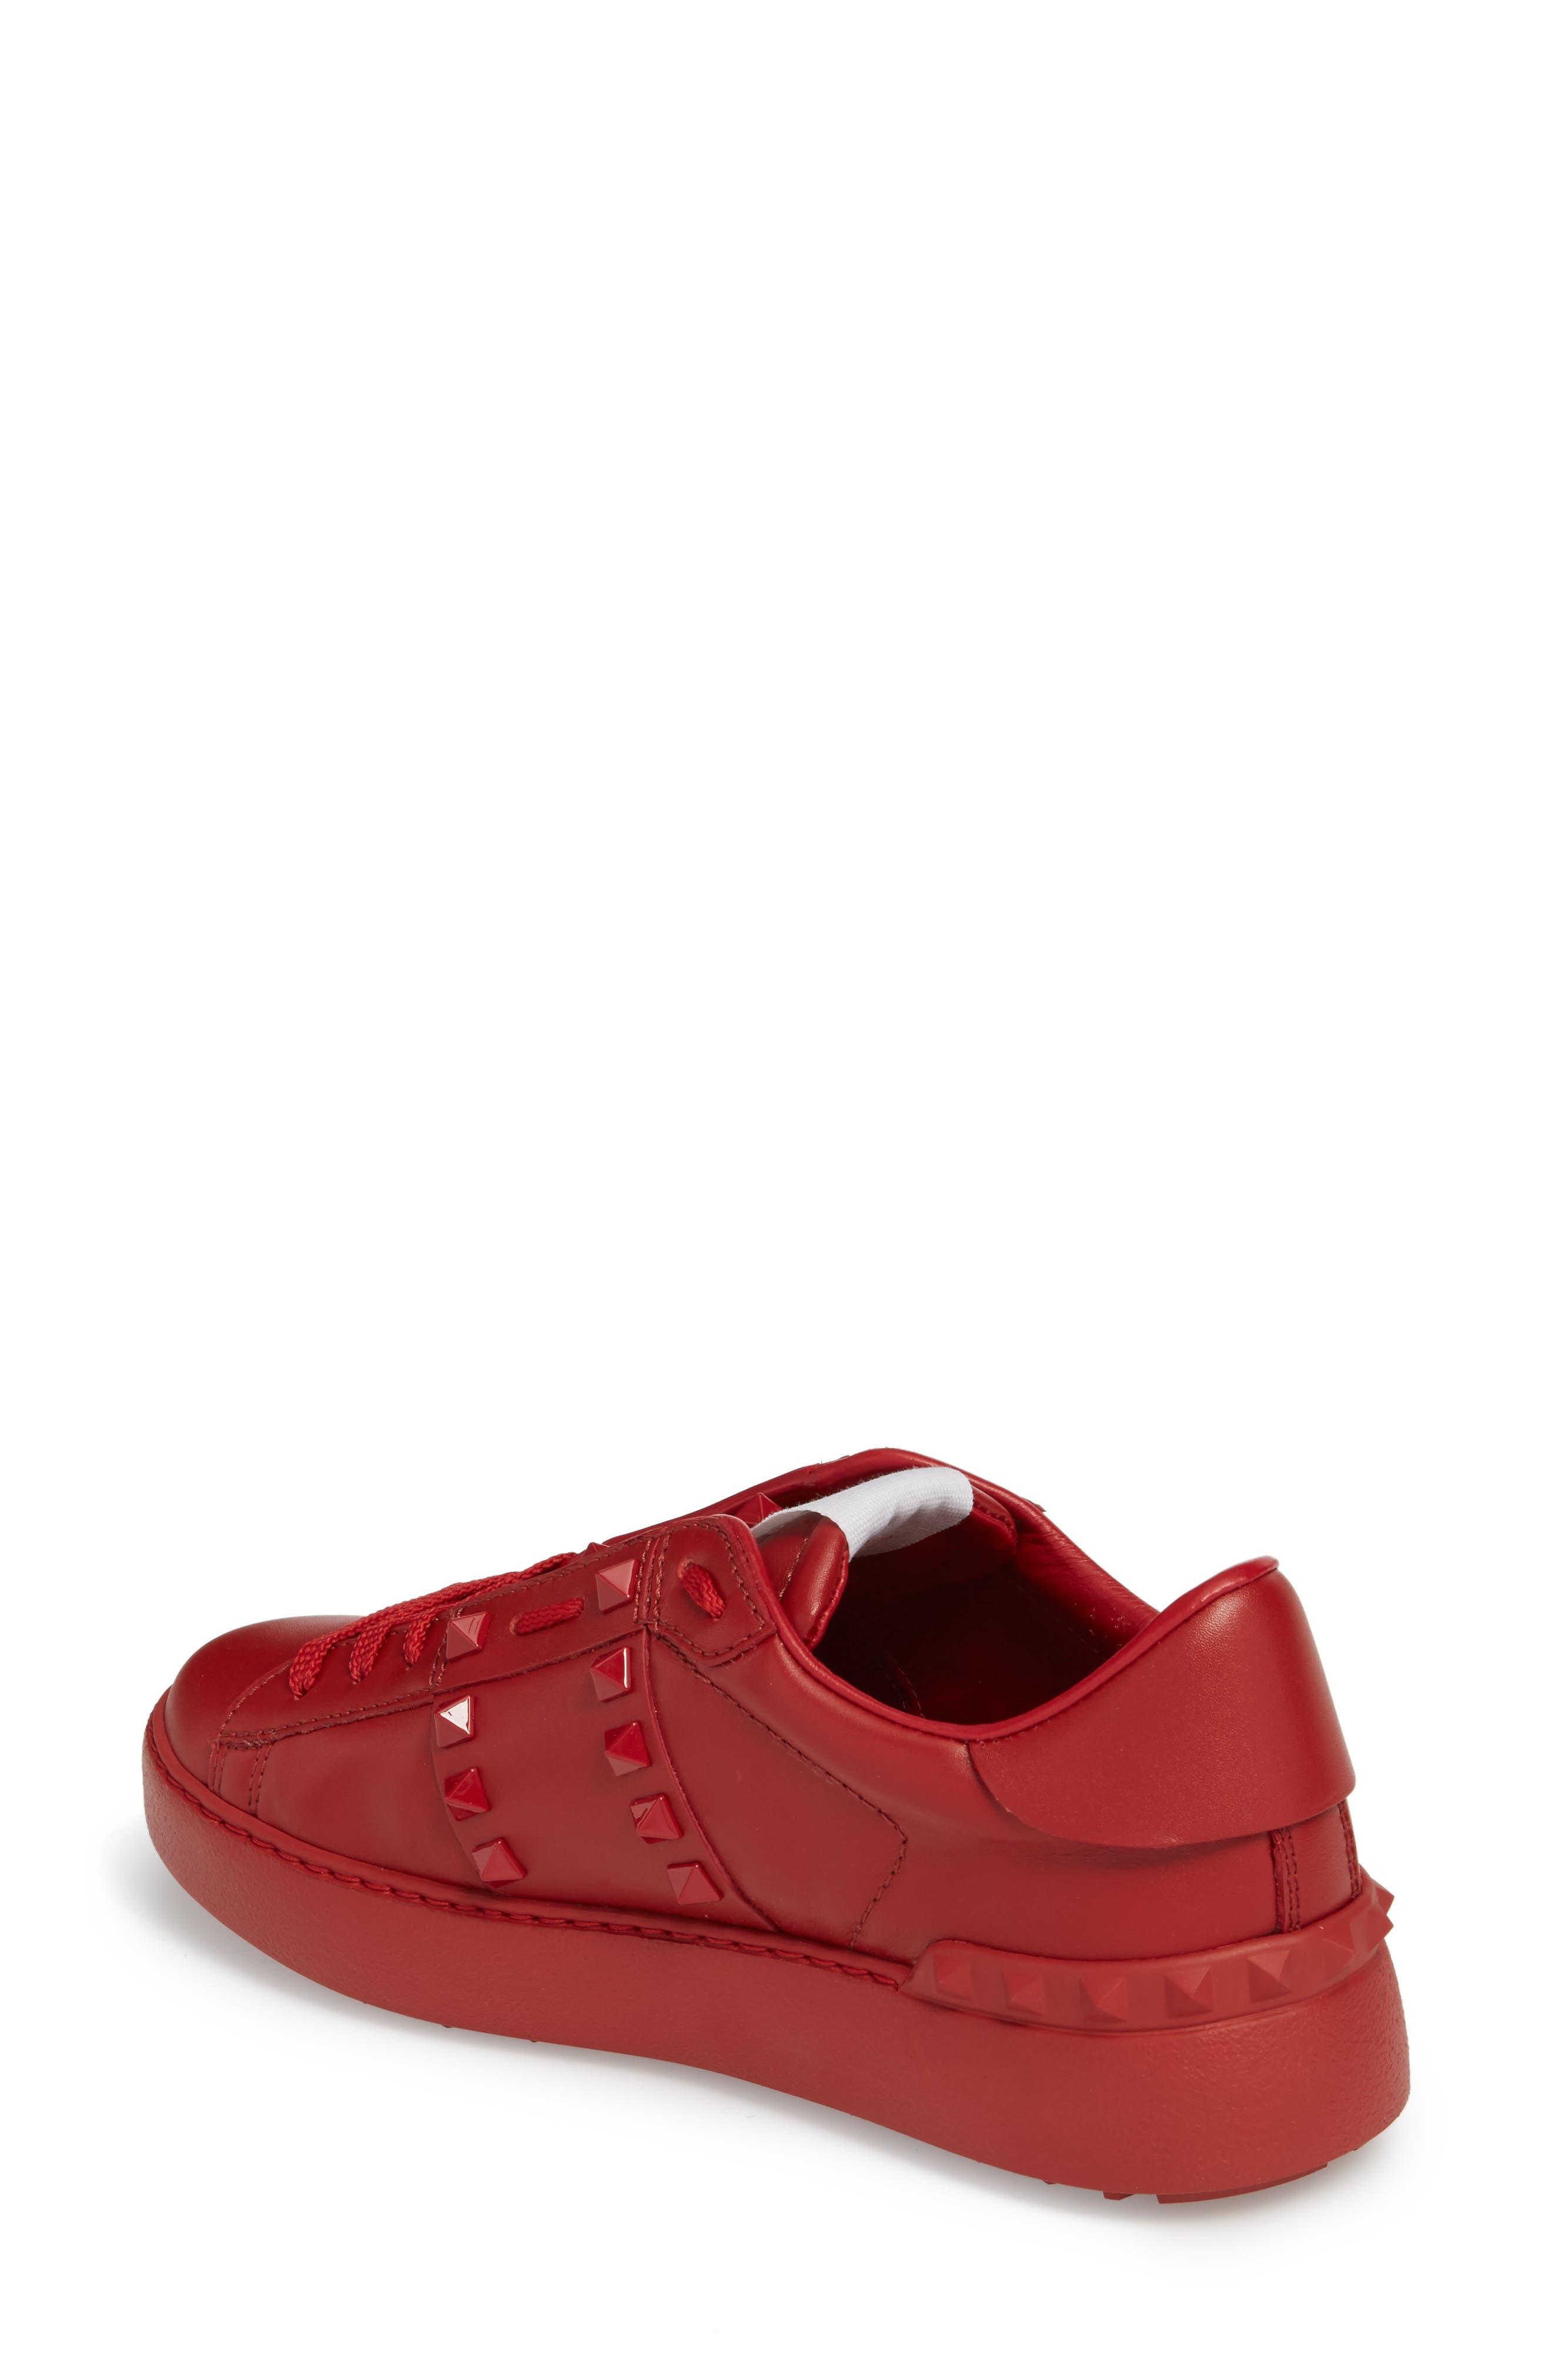 Rockstud Sneaker,                             Alternate thumbnail 2, color,                             Red